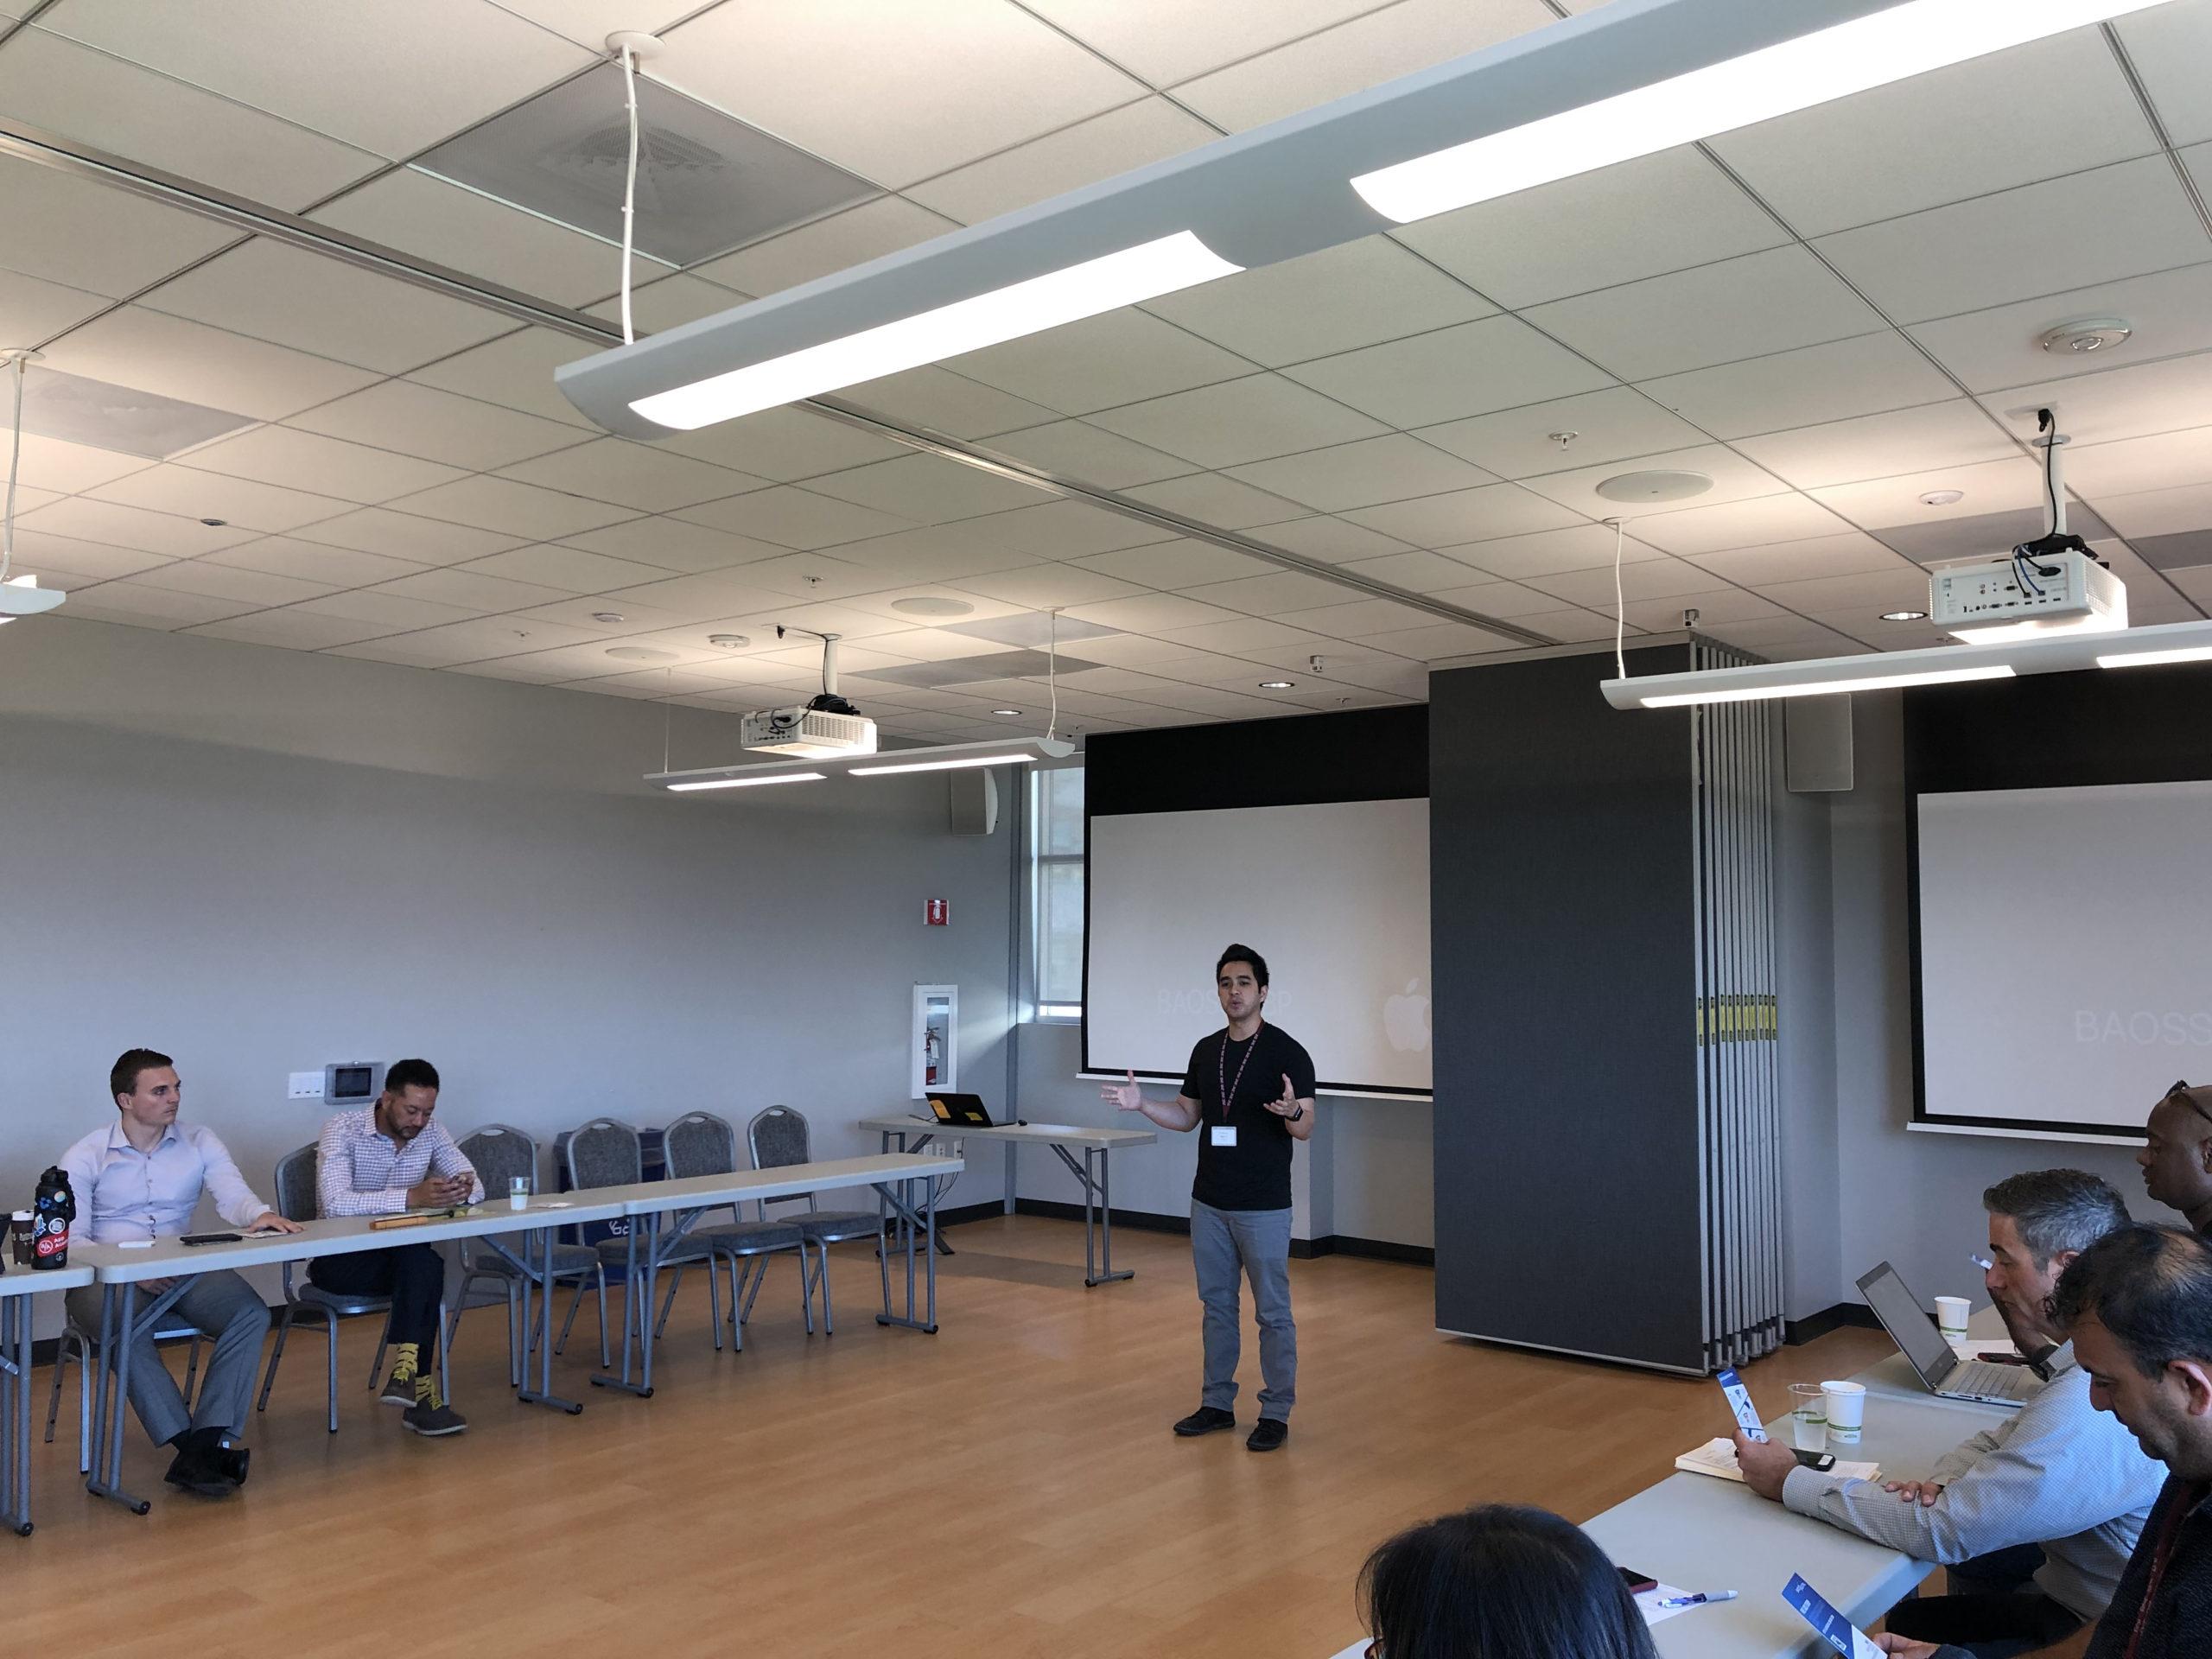 Bao Le, the Founder, and CEO of Baoss Digital